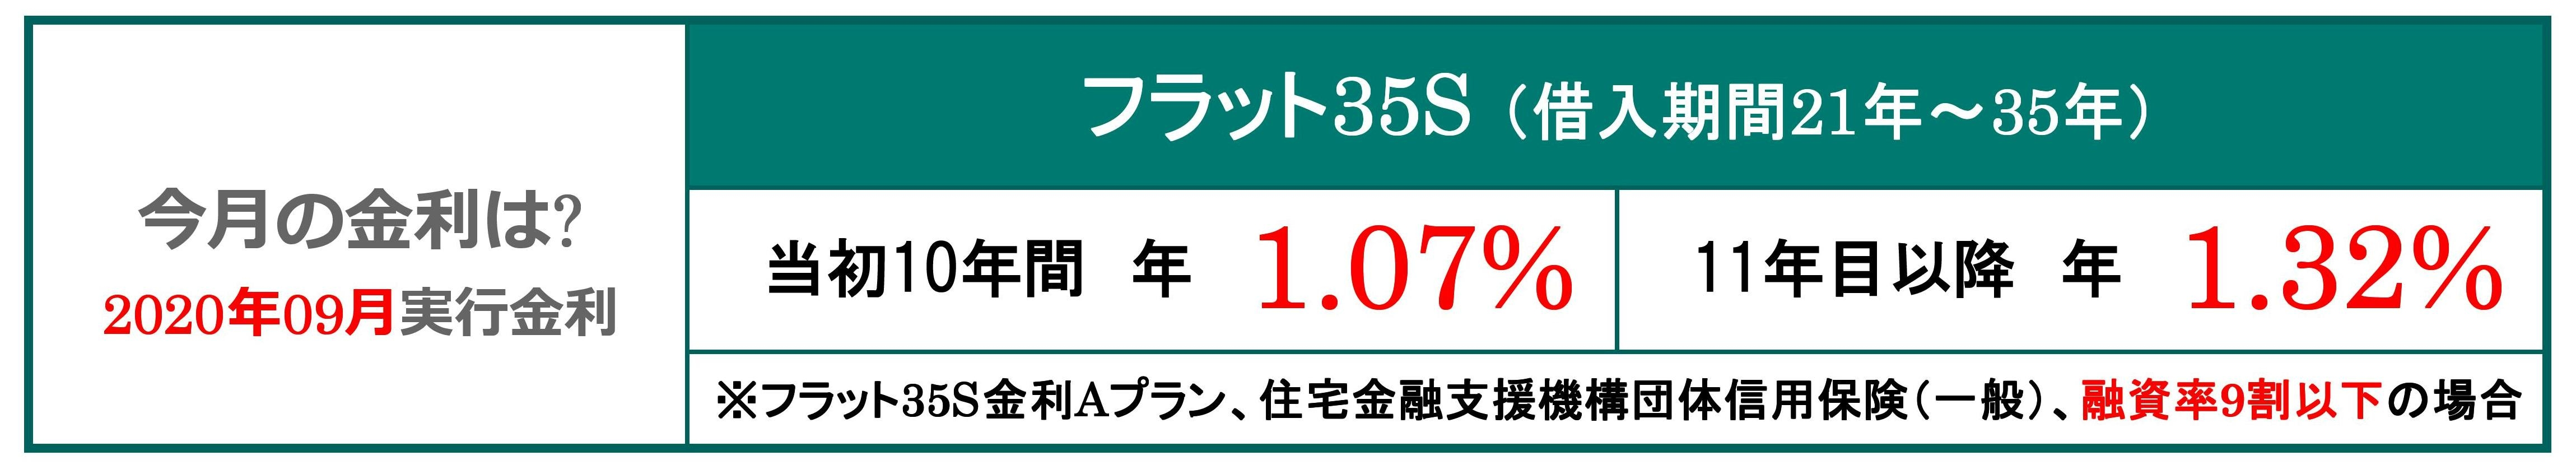 20200901kinri (1).jpg